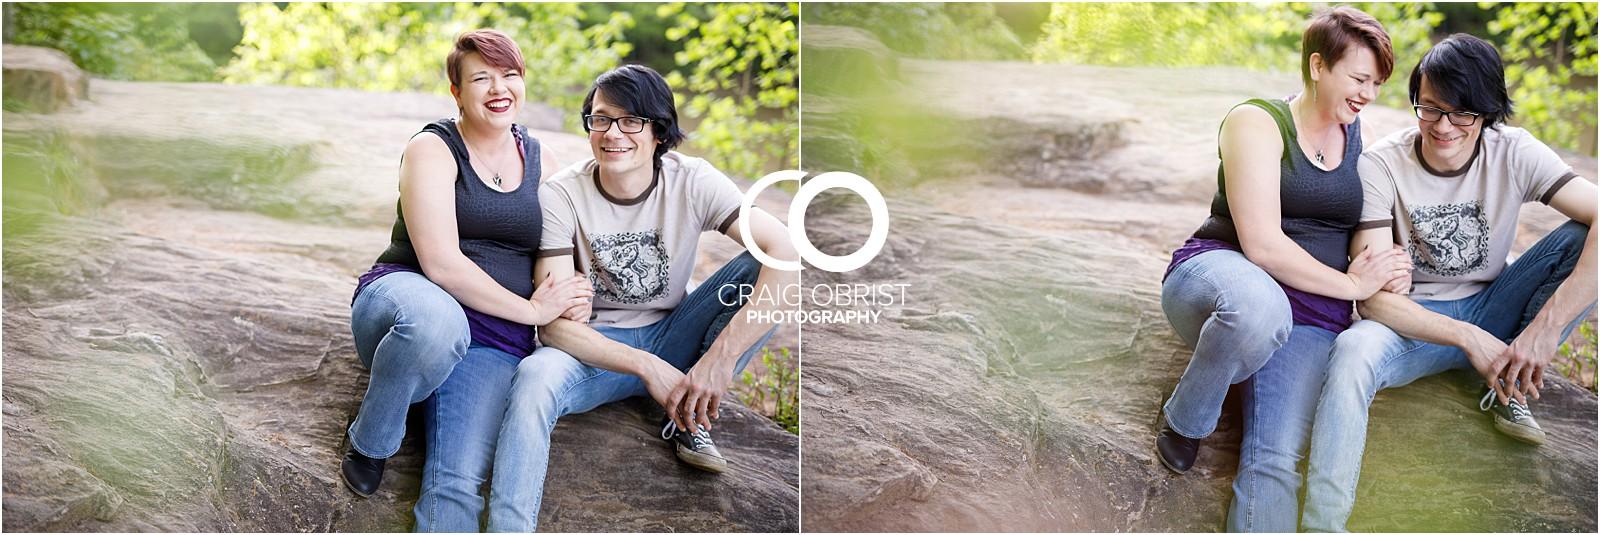 sweetwater creek park engagement portraits_0003.jpg